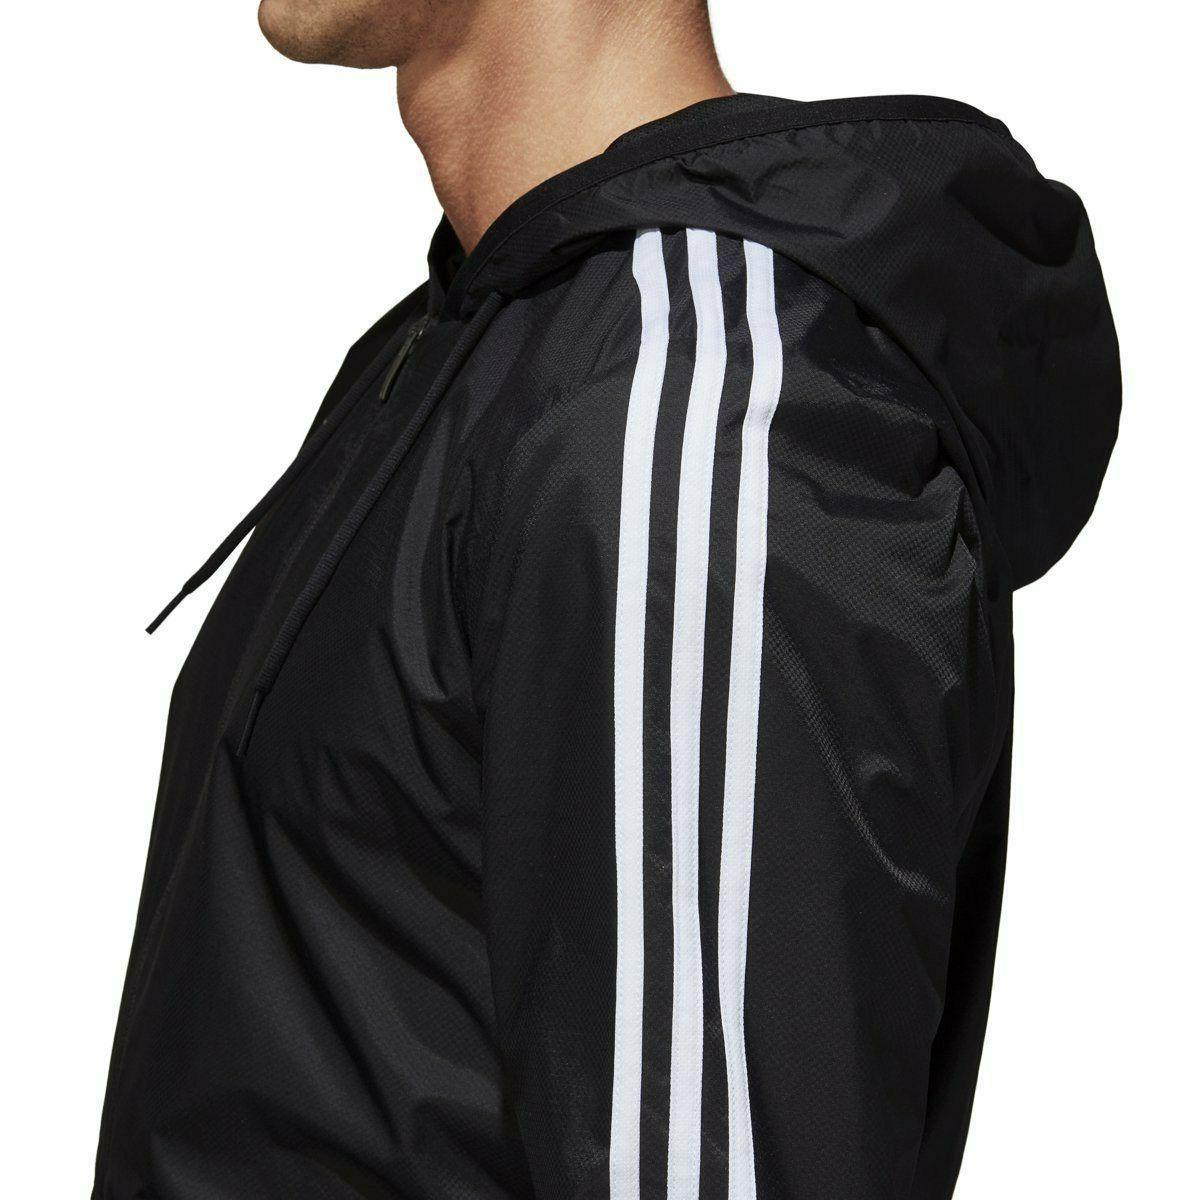 Adidas Wind Jacket White BS2232 S,M,L,XL